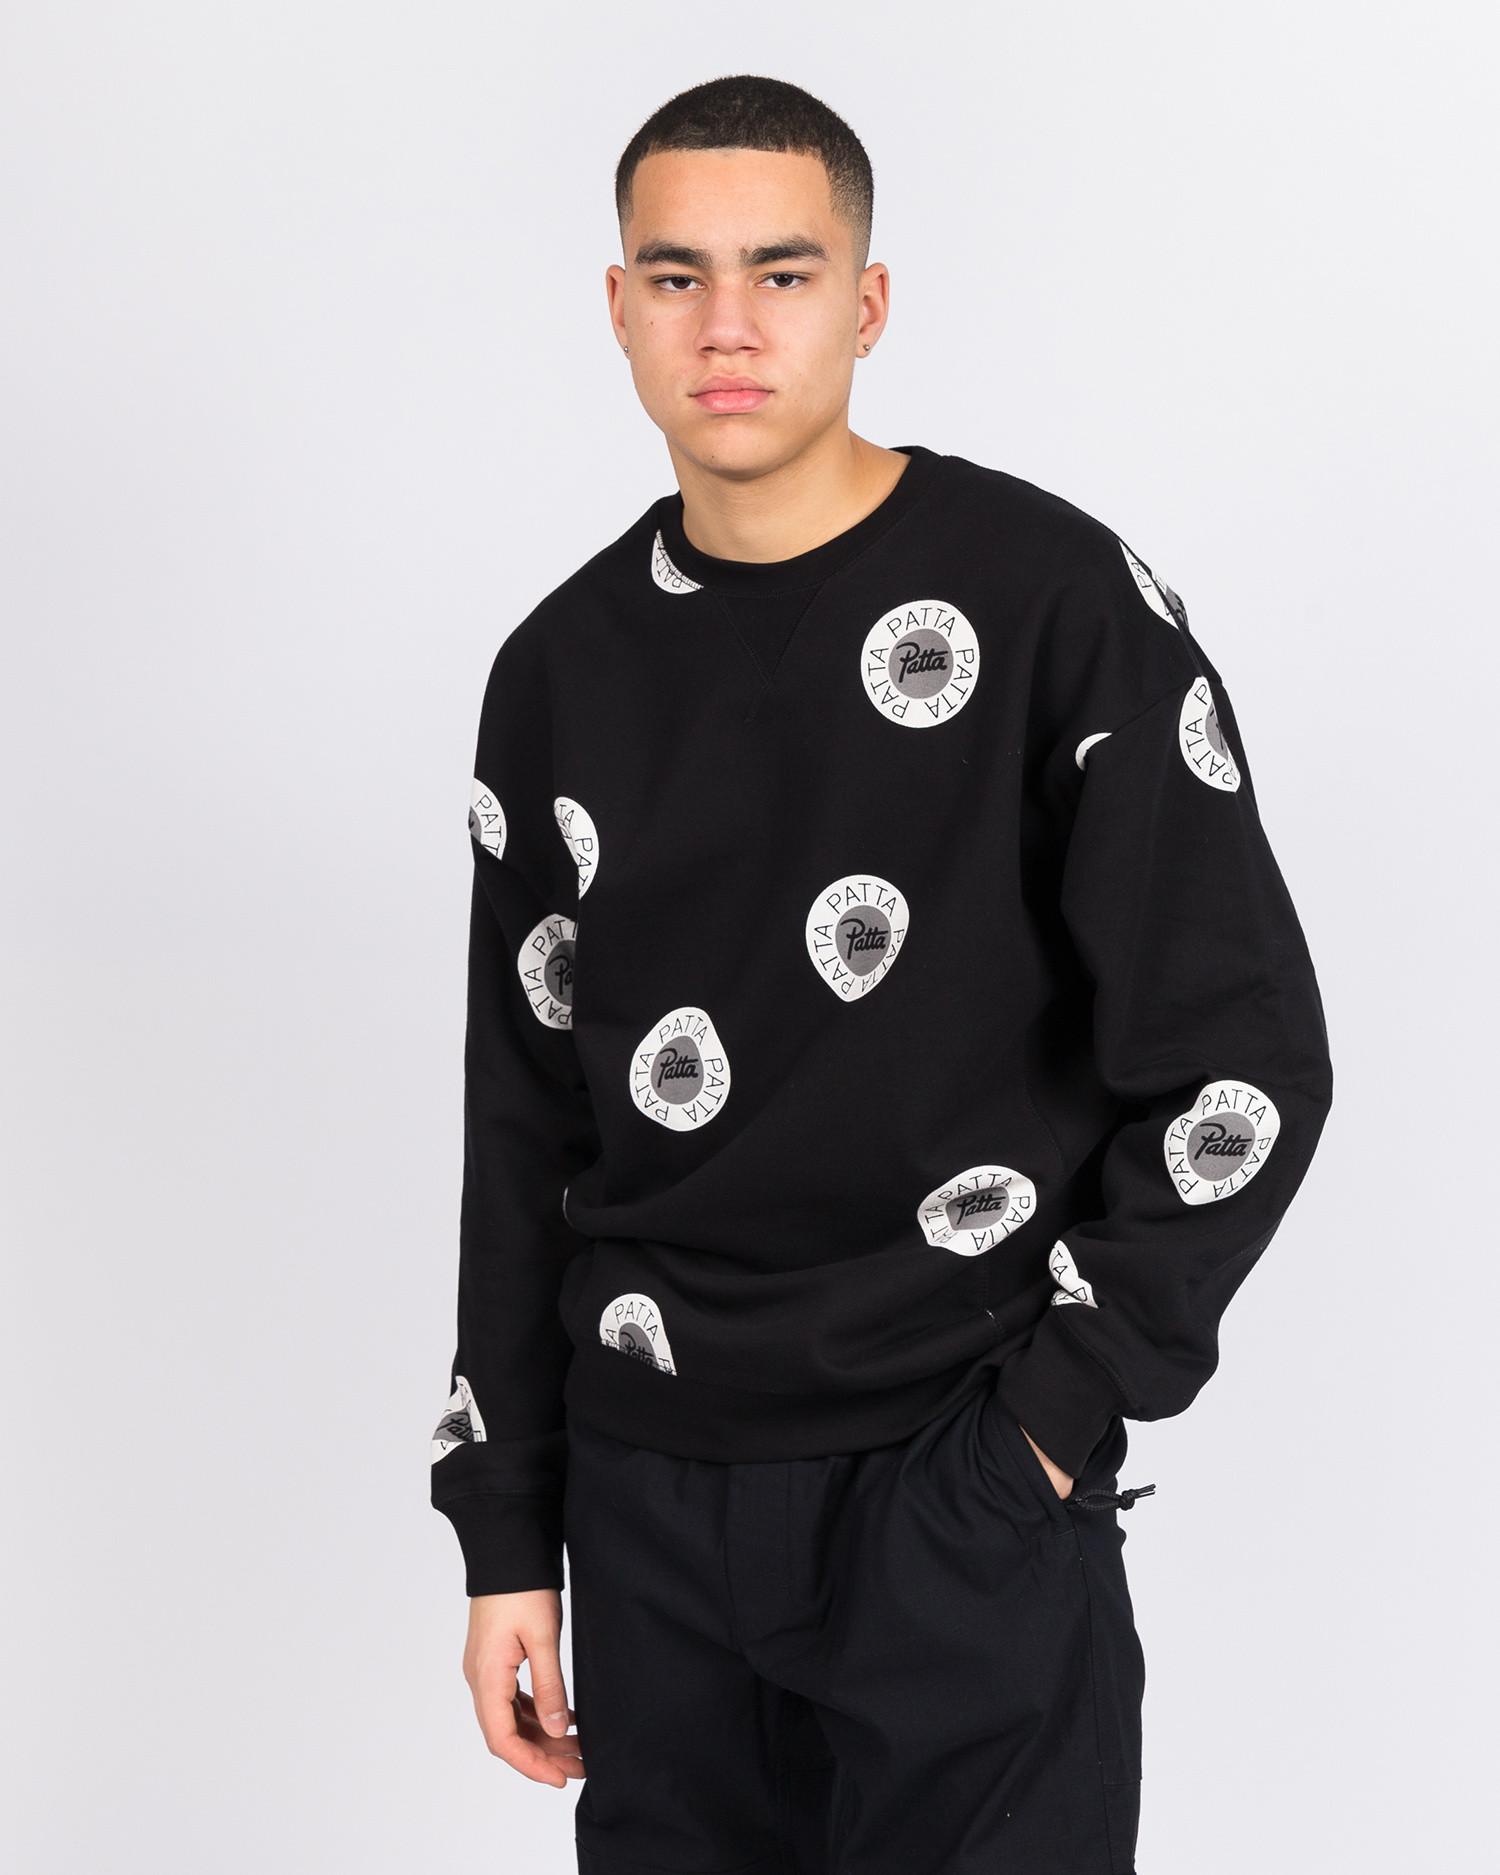 Patta Emblem Crewneck Sweater Black